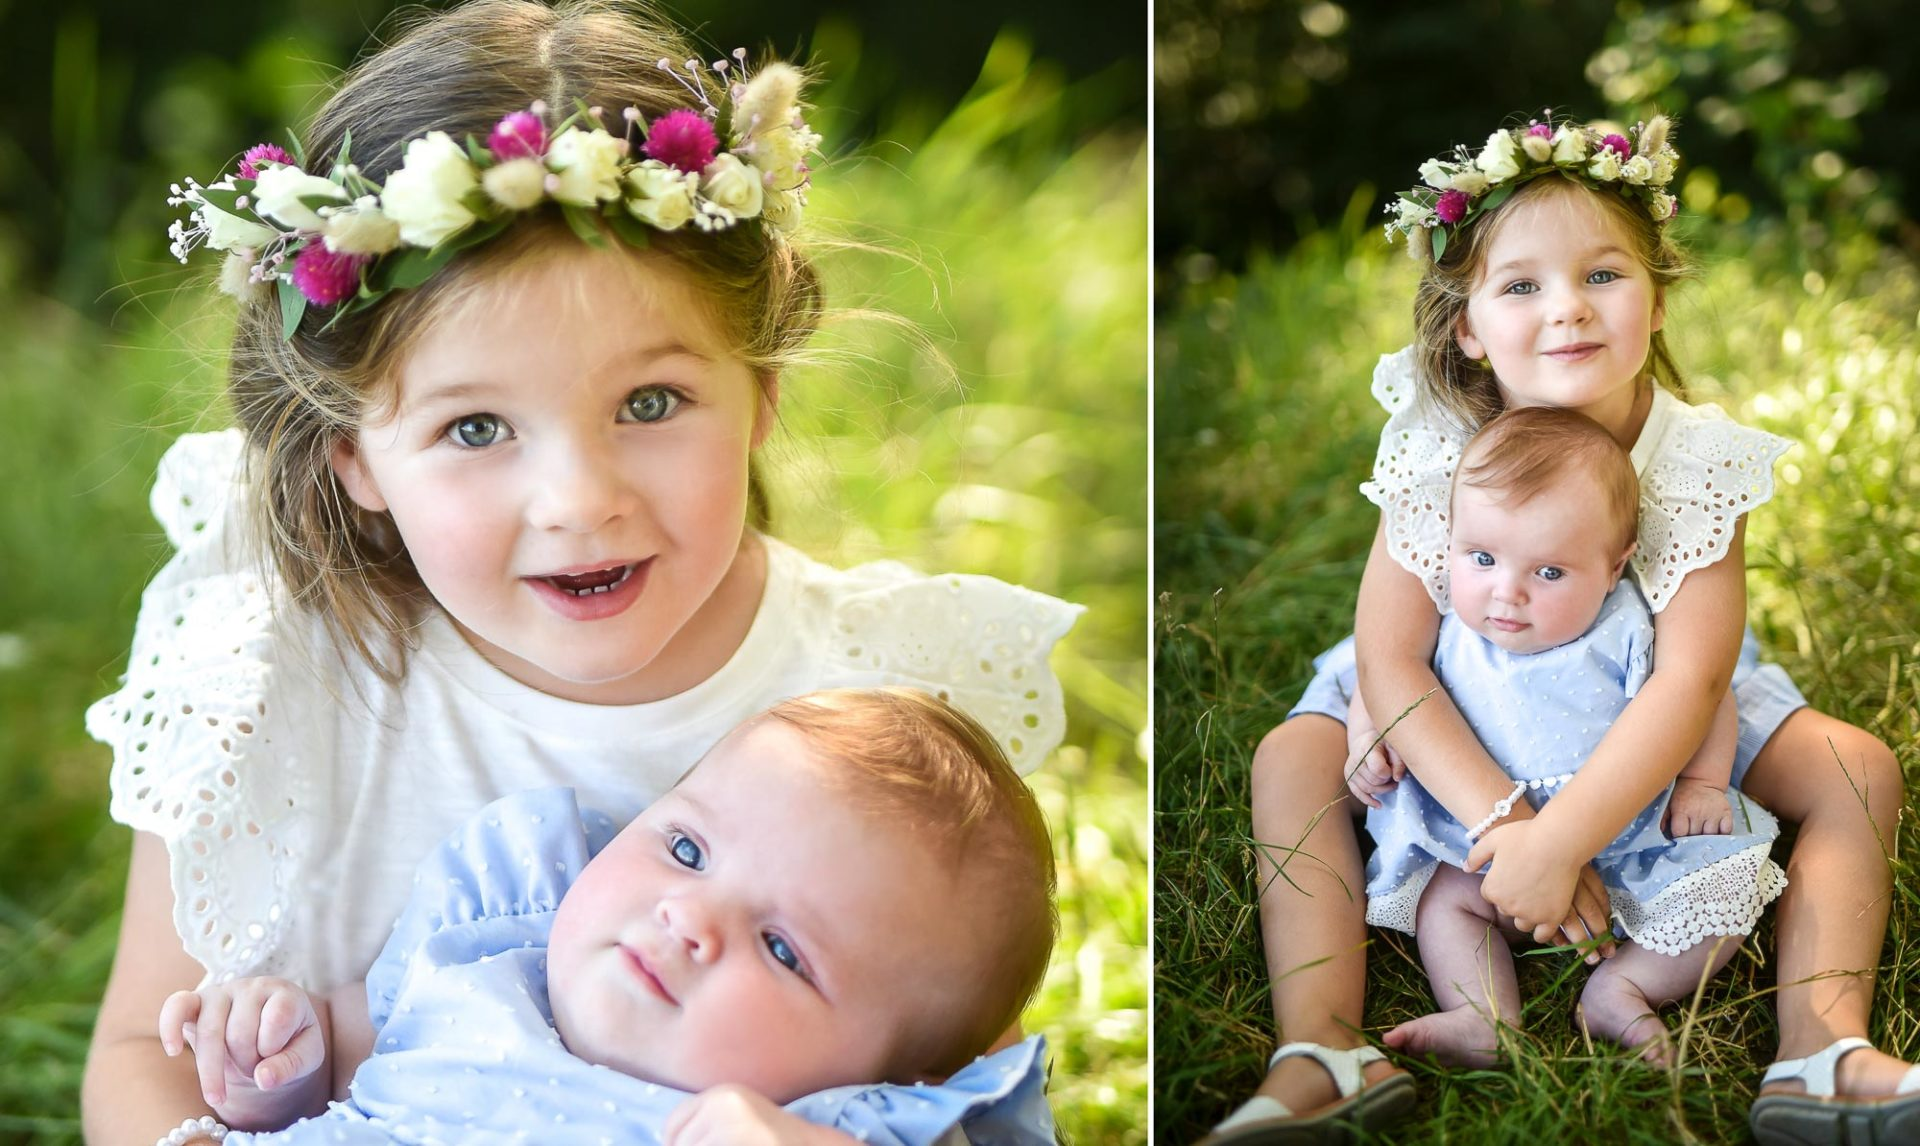 Shooting famille soeurs serre - Valentine Poulain 2 filles